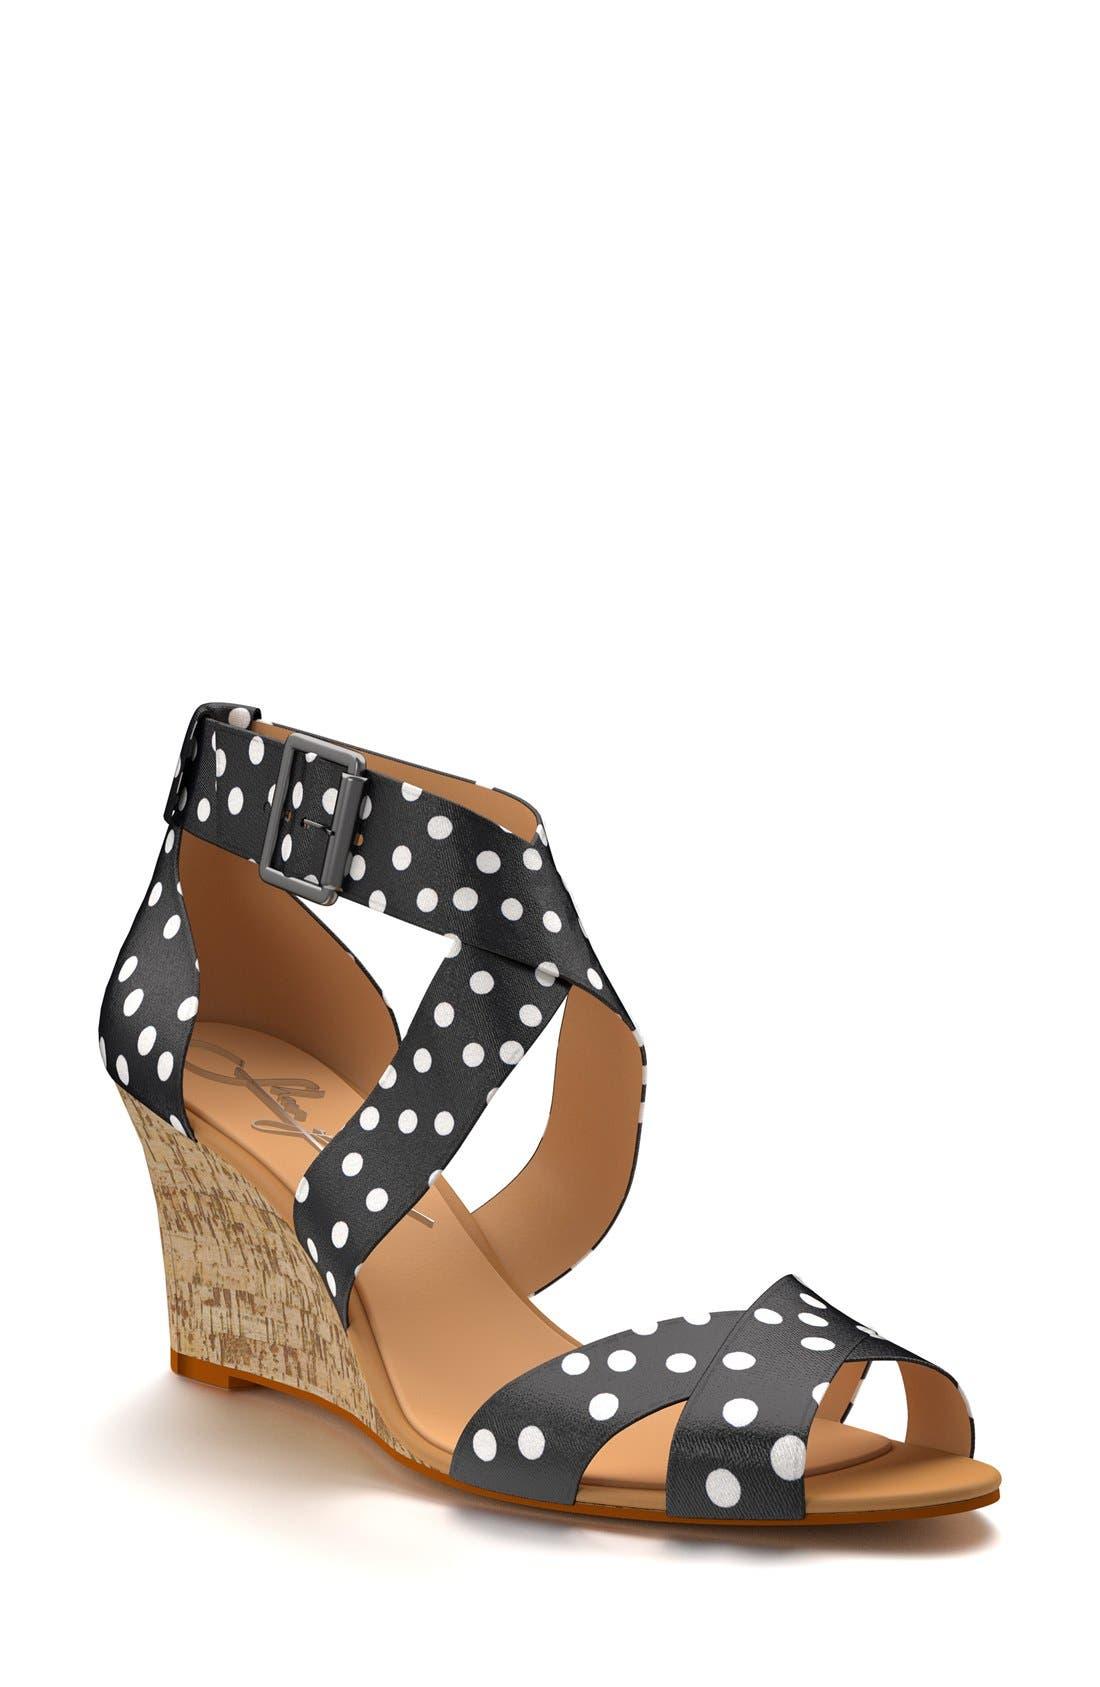 Main Image - Shoes of Prey Crisscross Strap Wedge Sandal (Women)